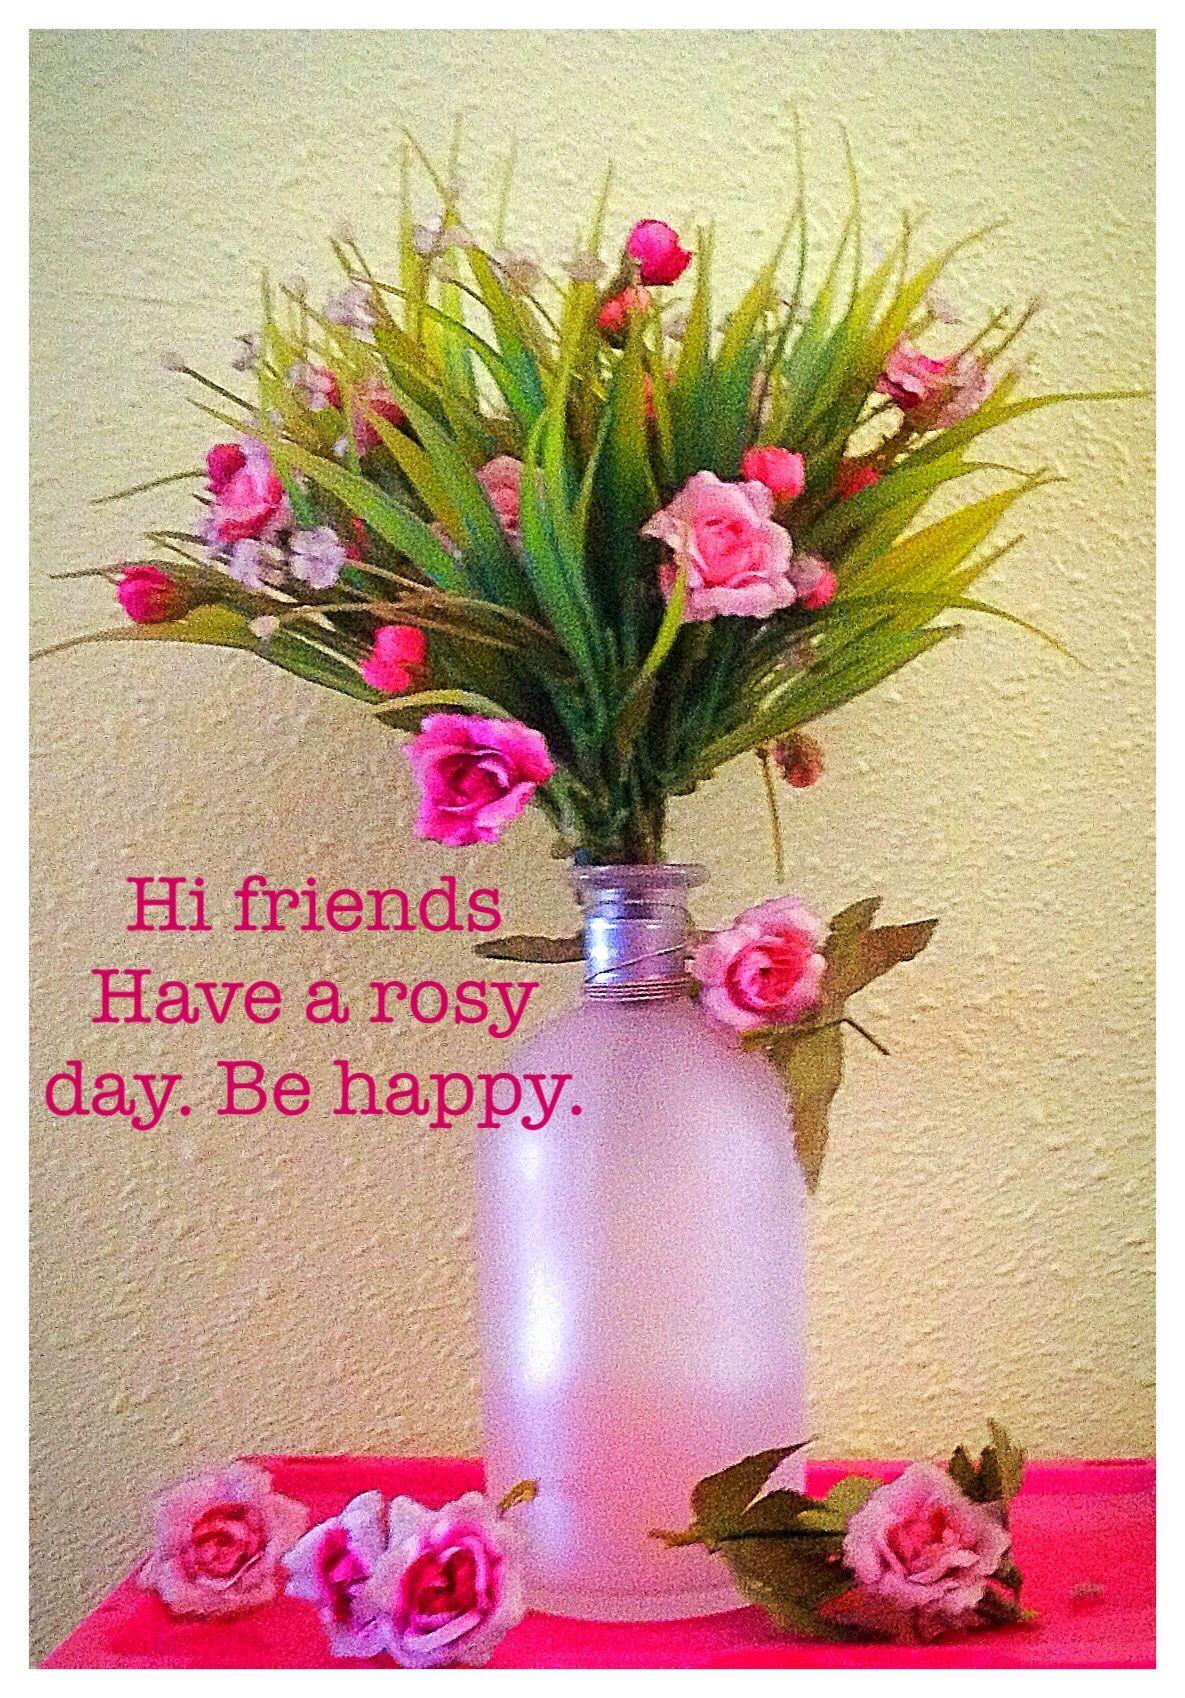 Daily greetings good morning pinterest morning greetings daily greetings m4hsunfo